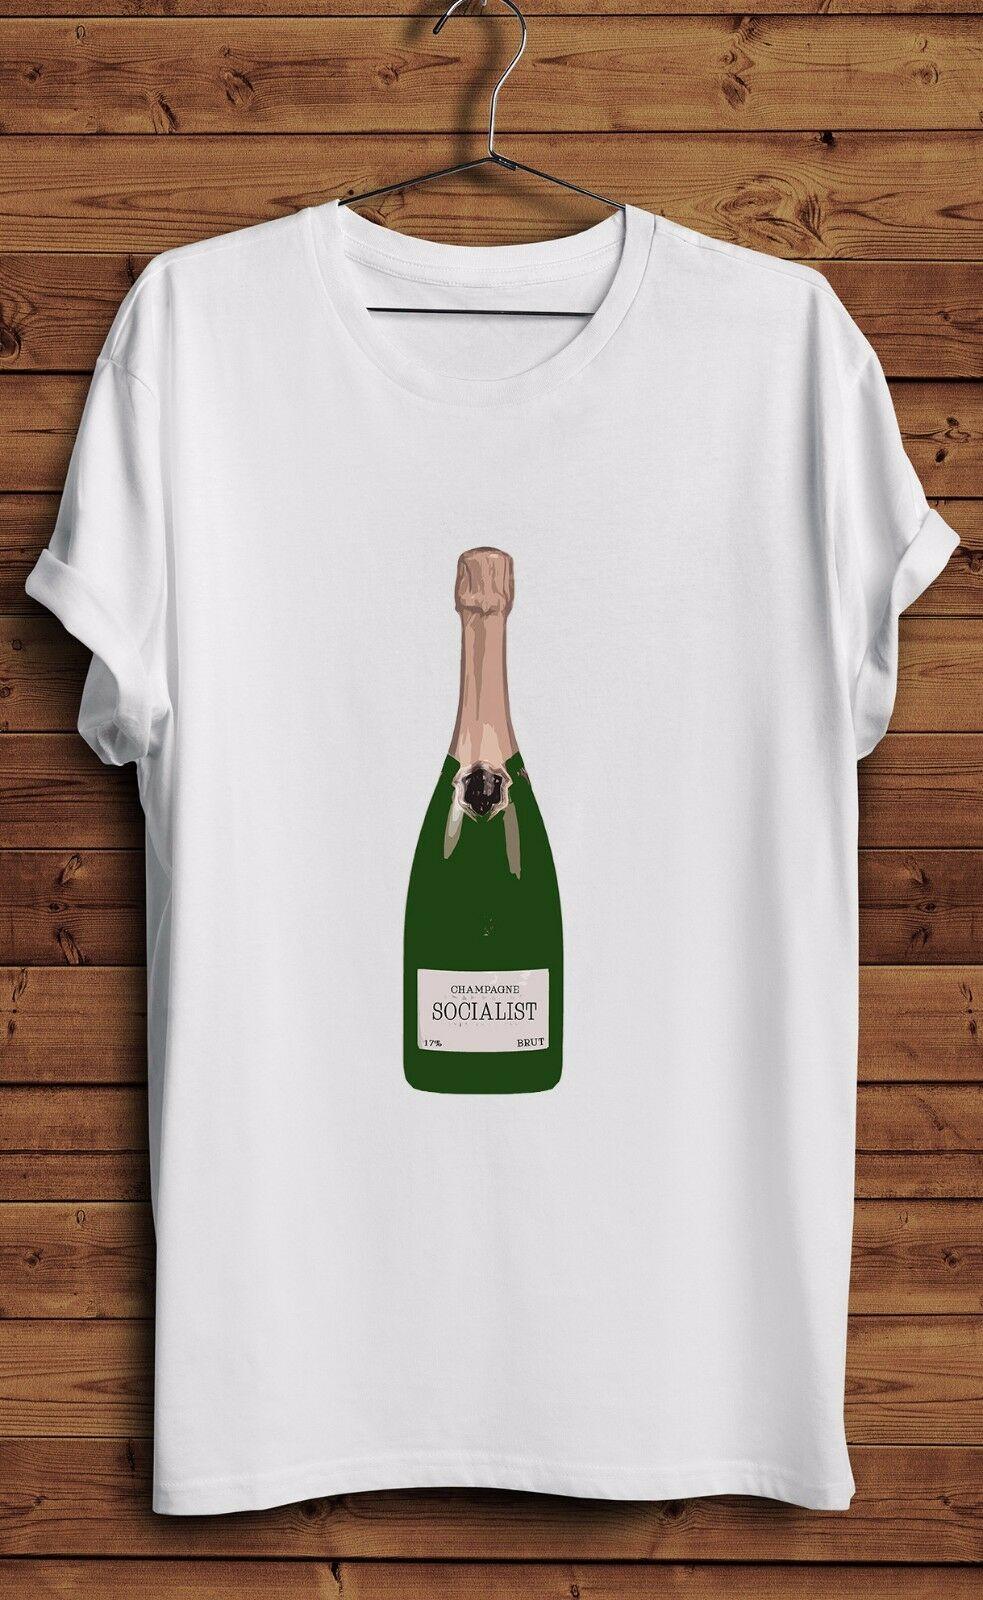 Champagne Socialist T Shirt Rich Kids Socialism Labour Corbyn Left Wing Liberal